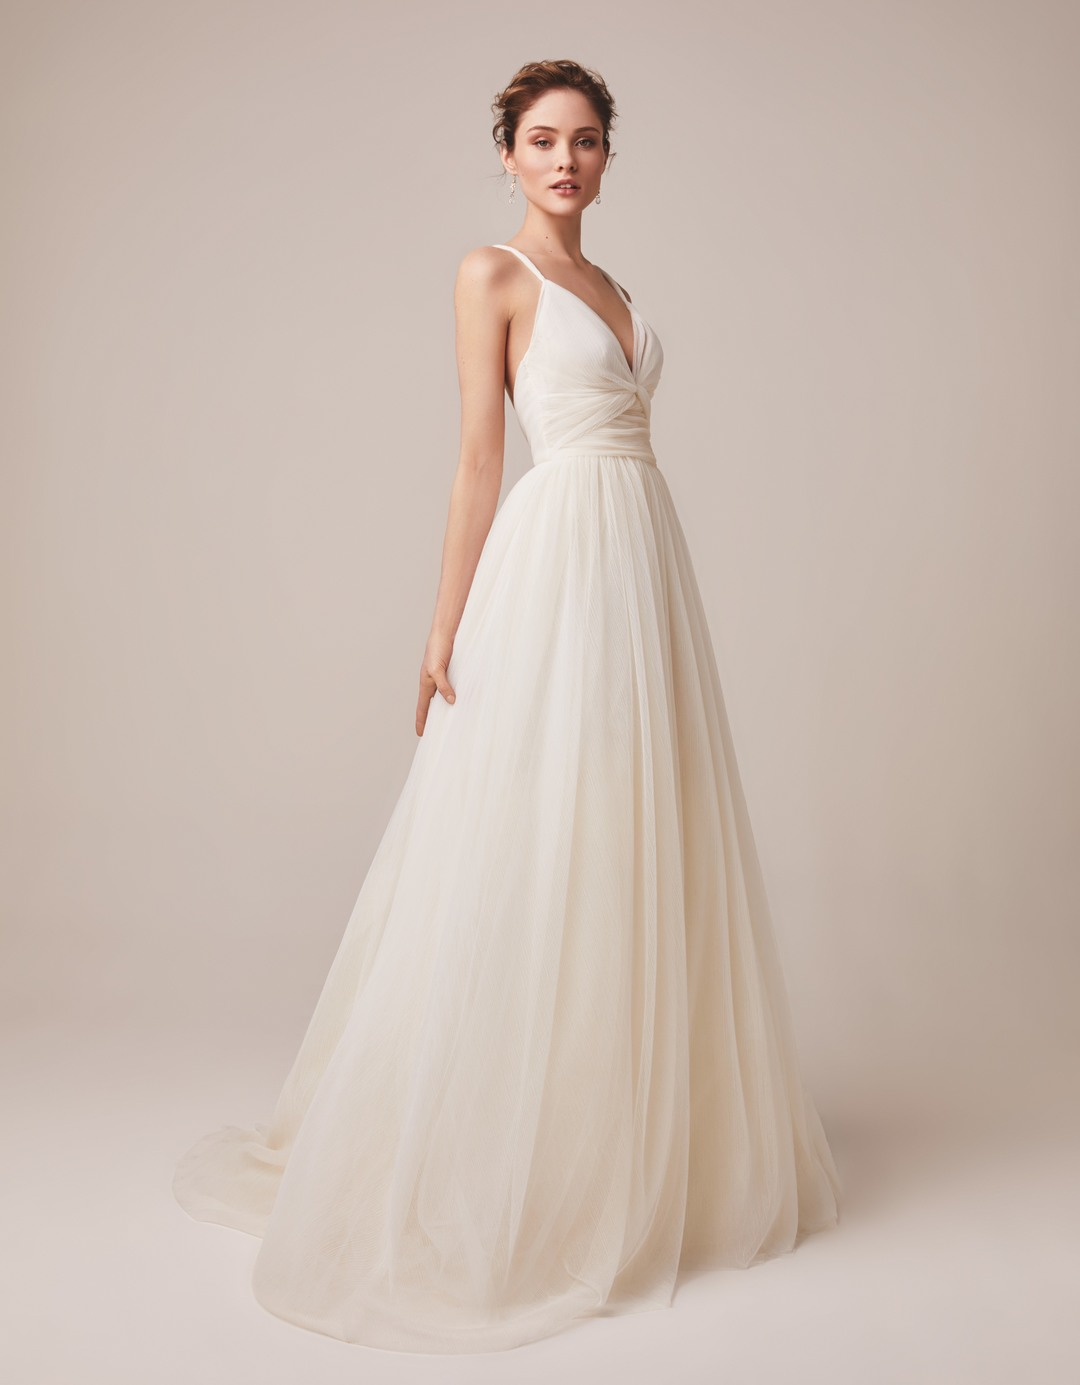 148 dress photo